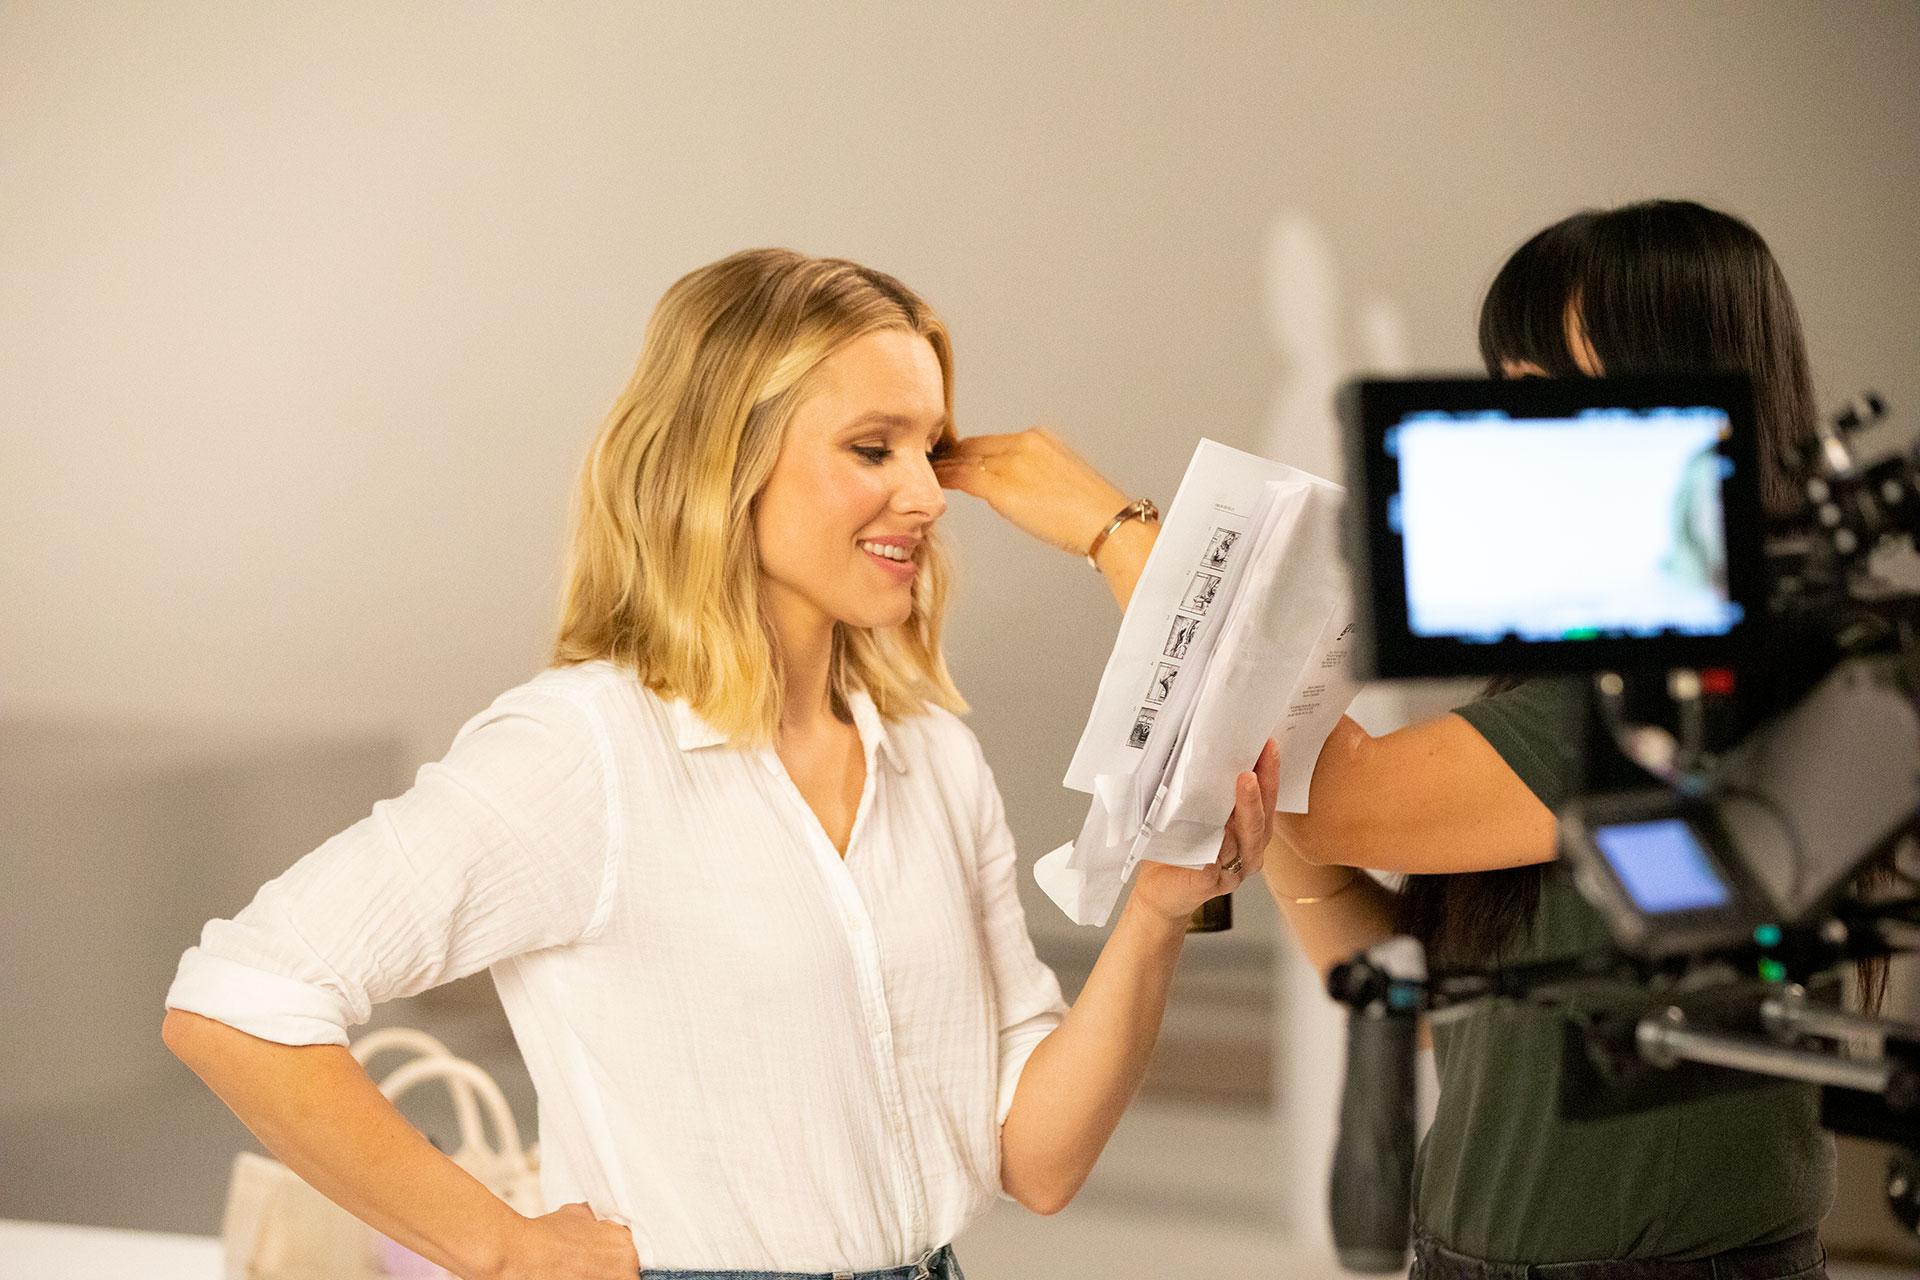 Kristen Bell recording spindrift ad